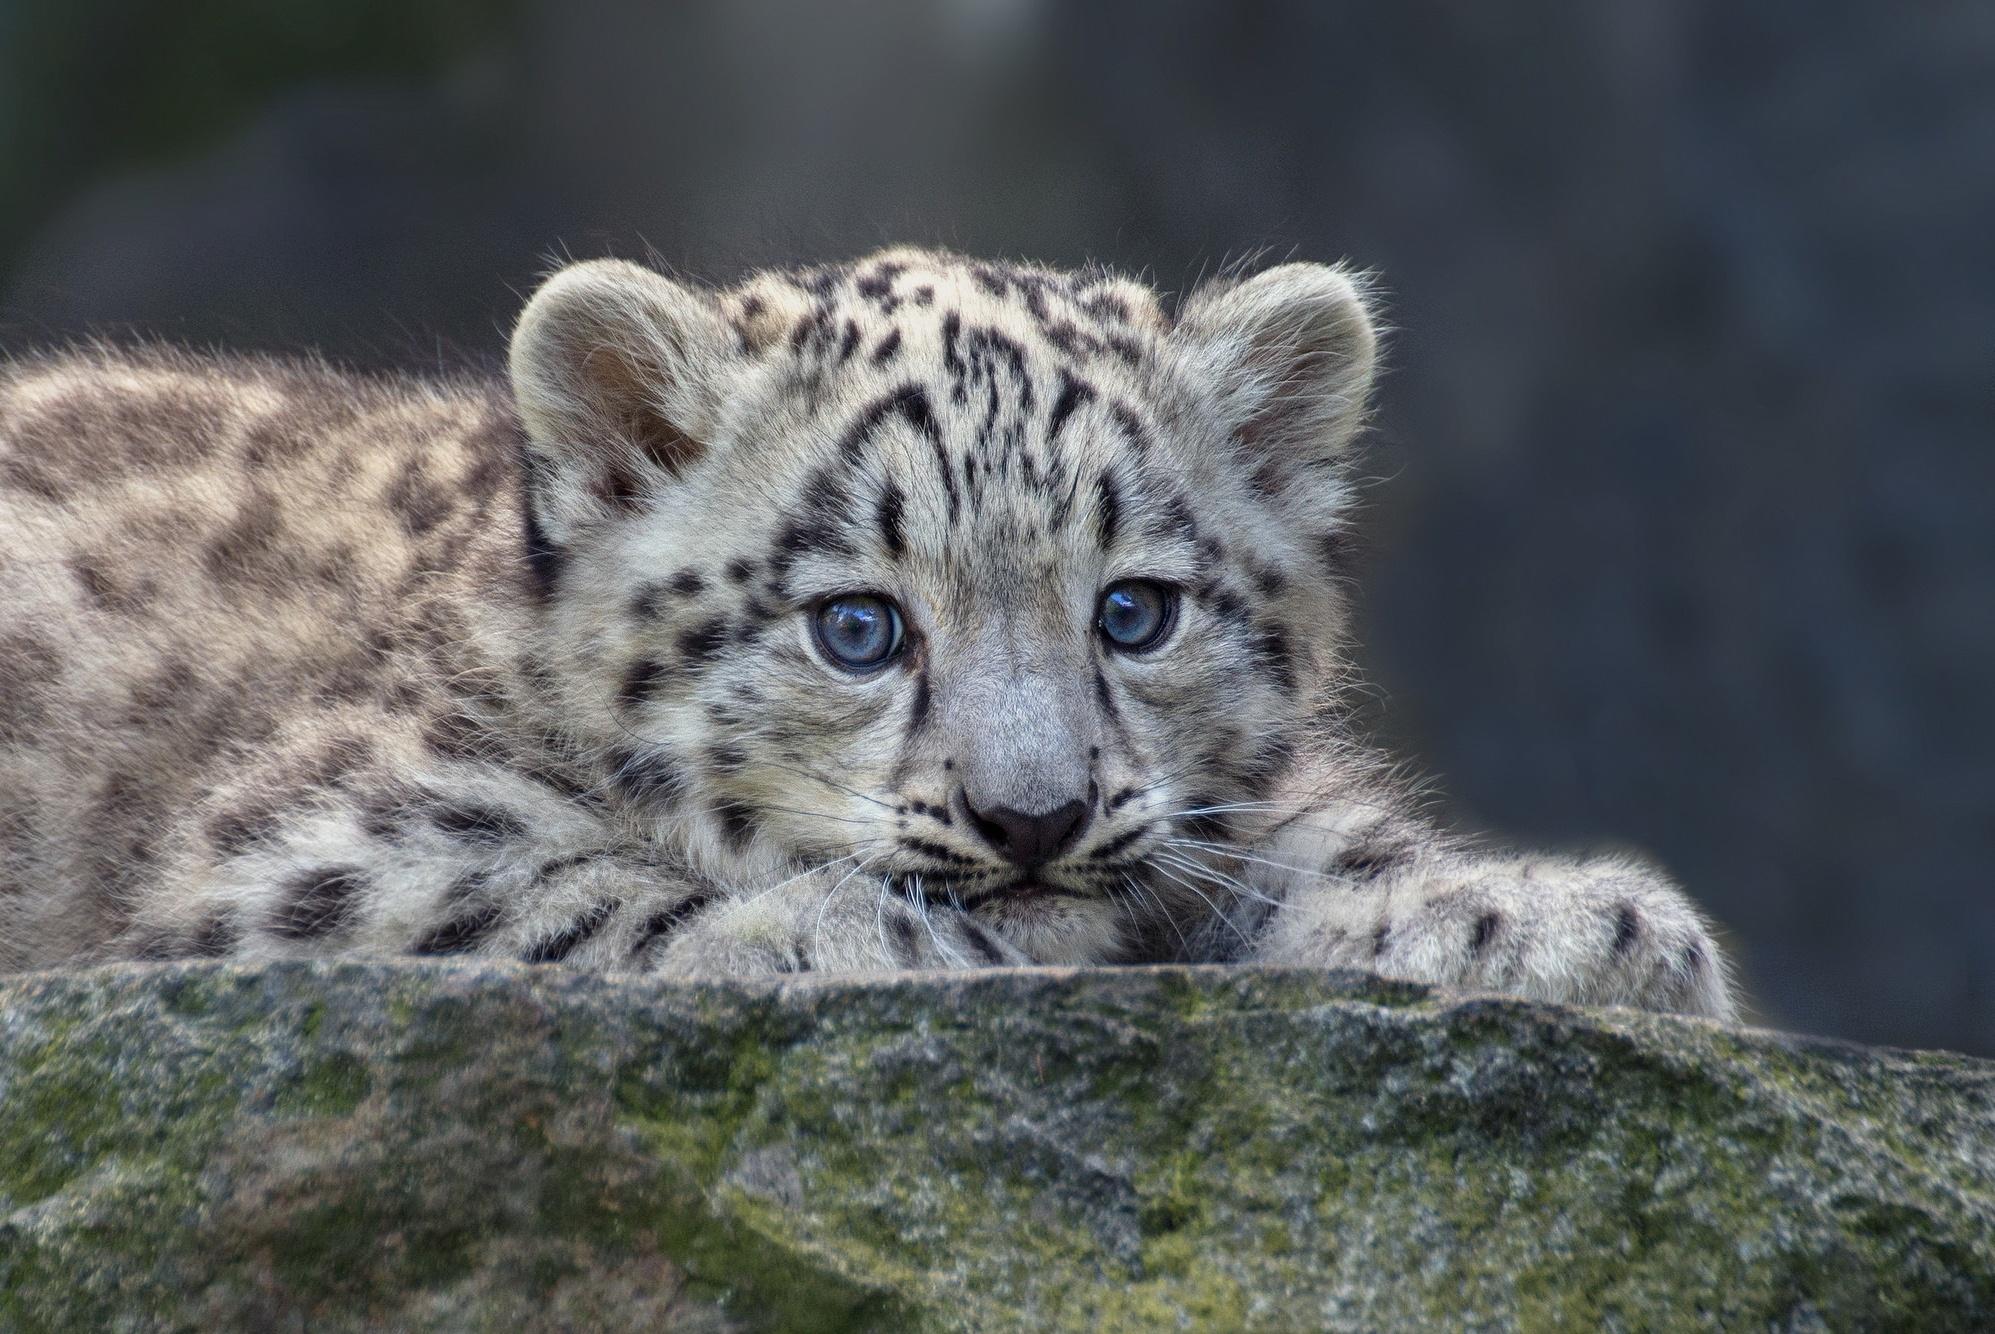 Snow Leopard Wildlife Wallpapers ID935249